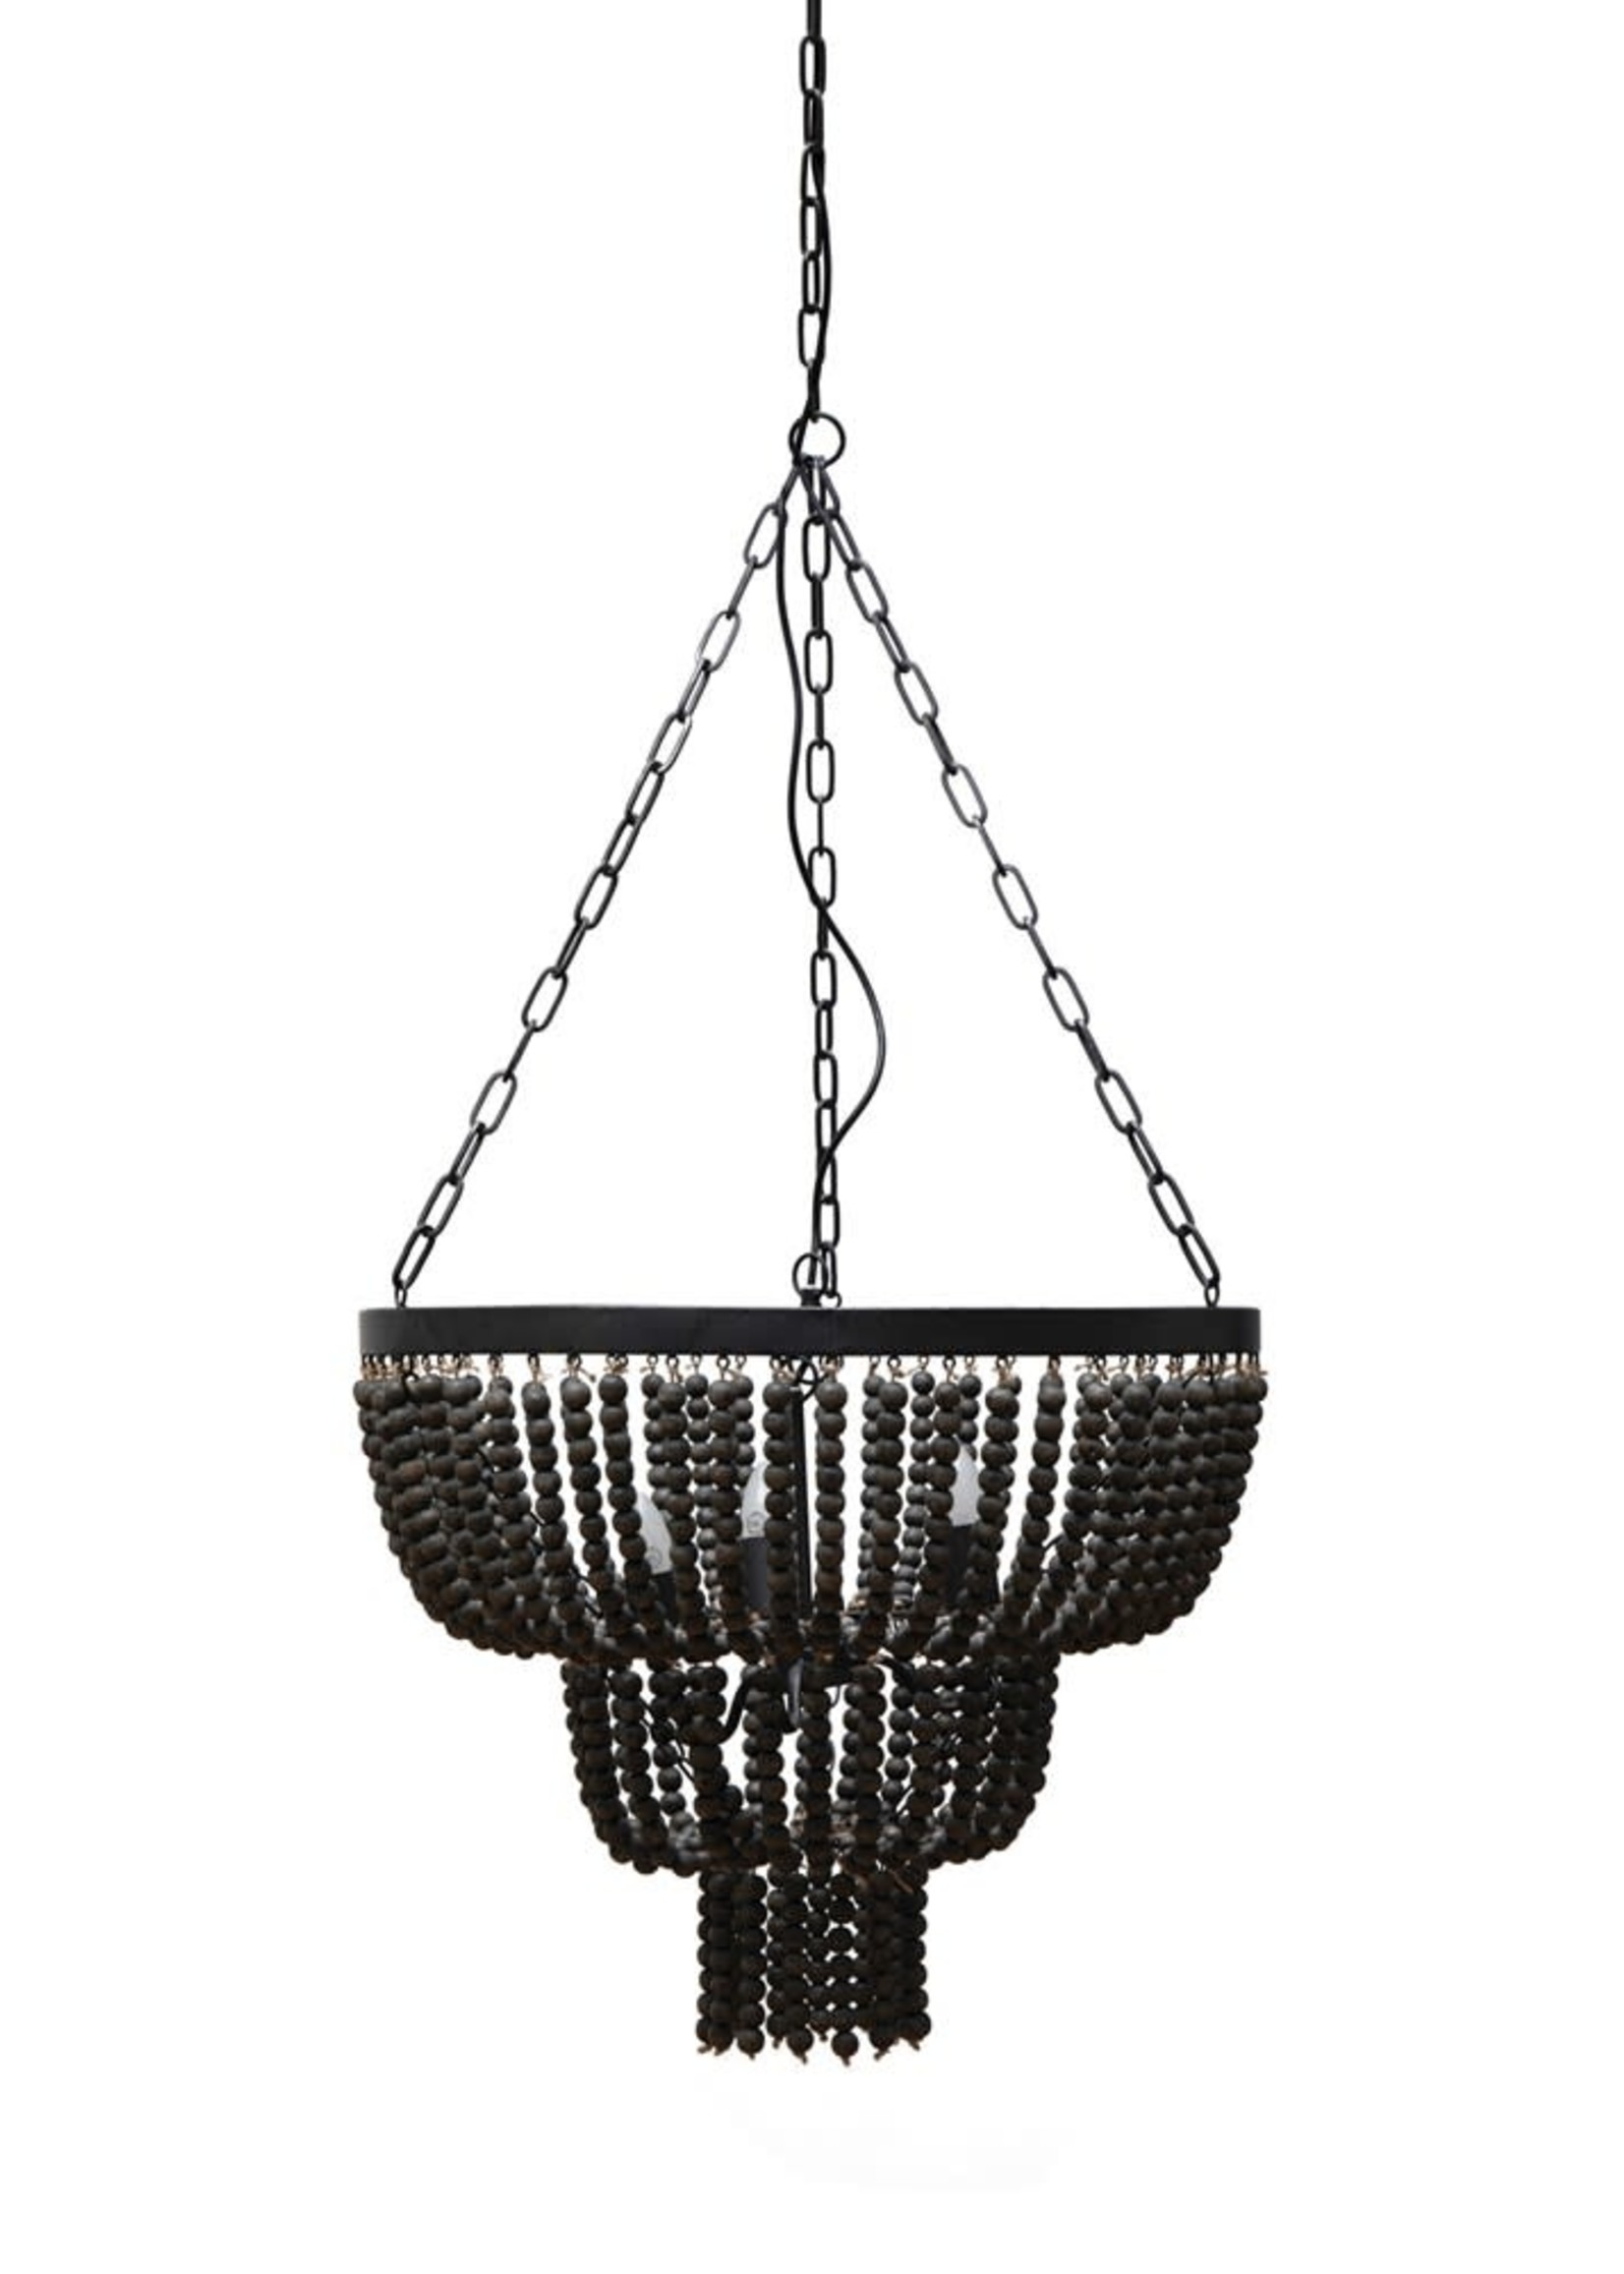 Round Iron Pendant Lamp w/ Wood Beads